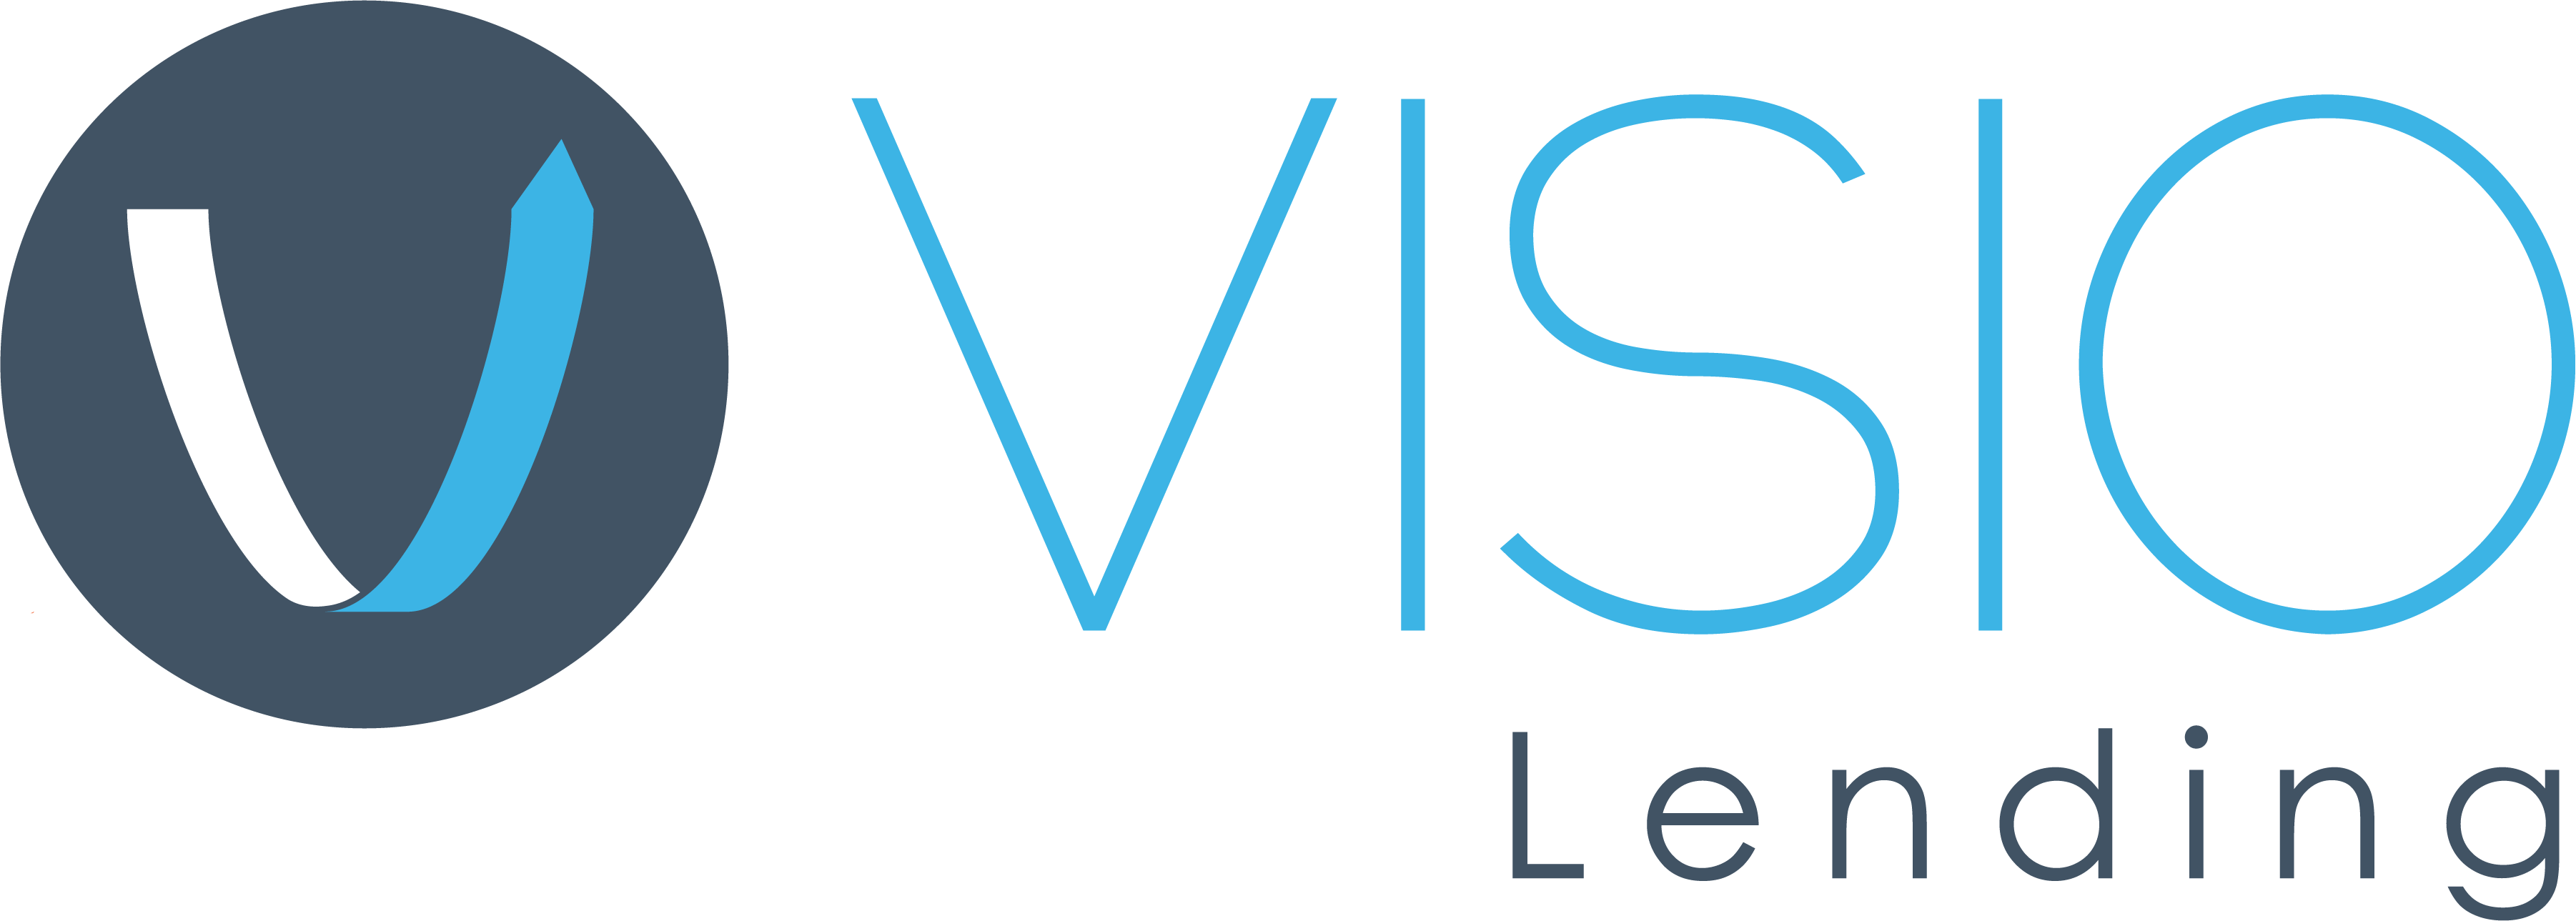 Visio Financial Services, Inc.  Company Logo